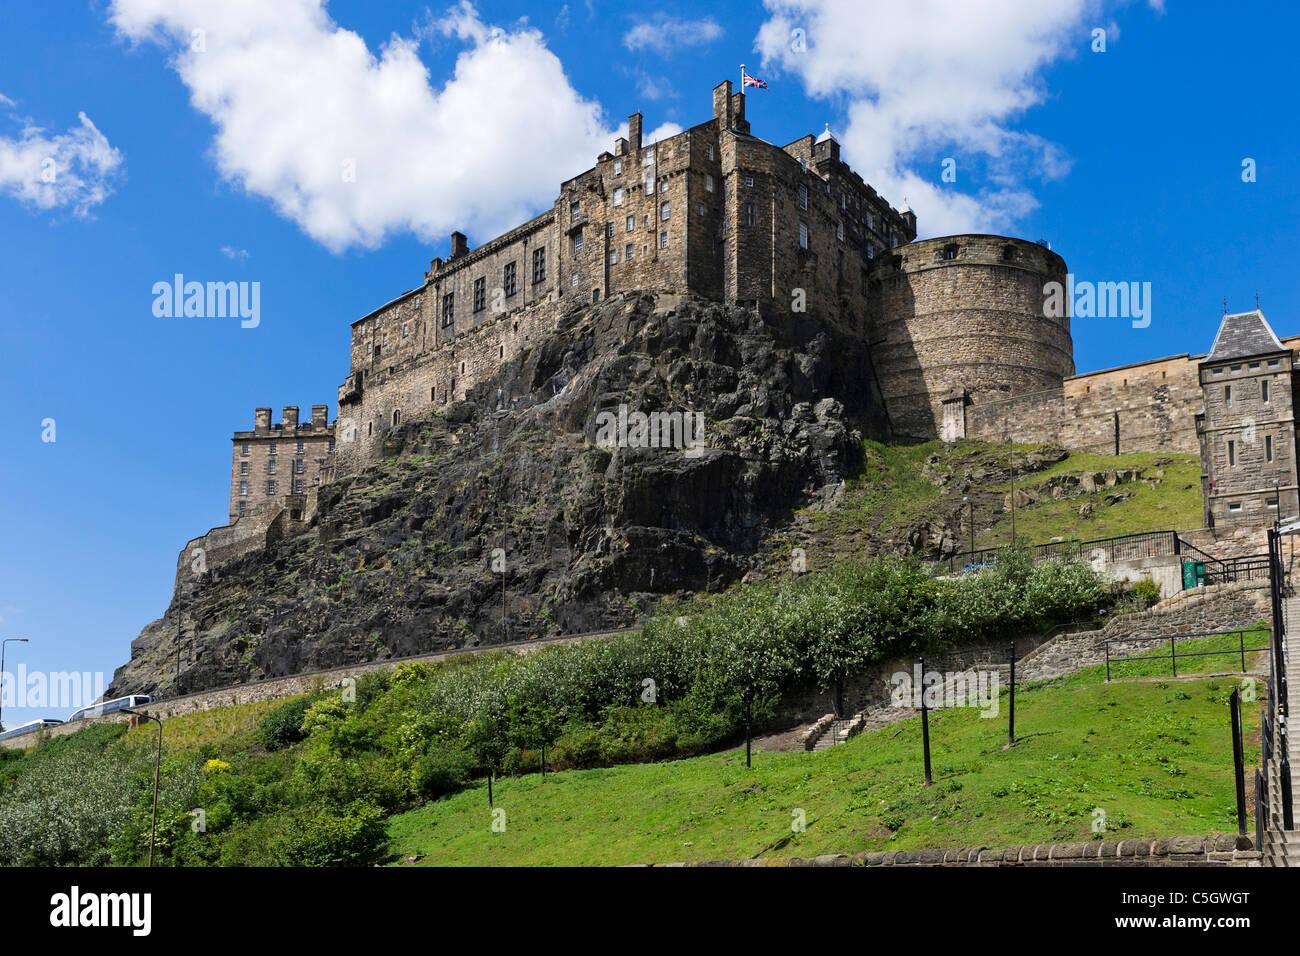 Edinburgh Castle viewed from Grassmarket, Old Town, Edinburgh, Scotland, UK - Stock Image